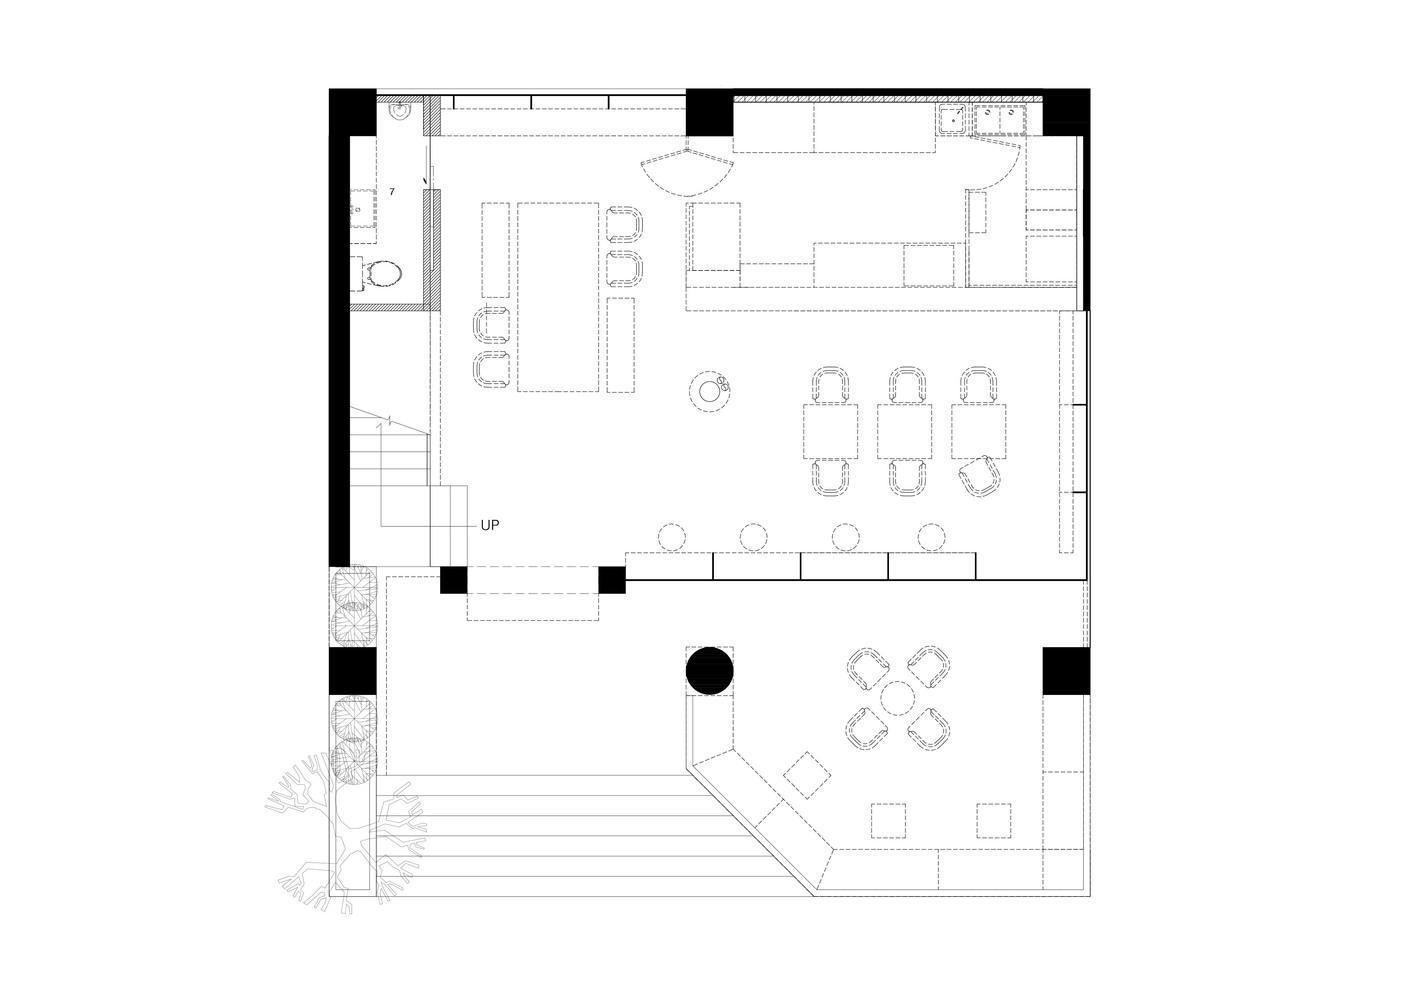 gallery of storyline cafe junsekino architect and design 25